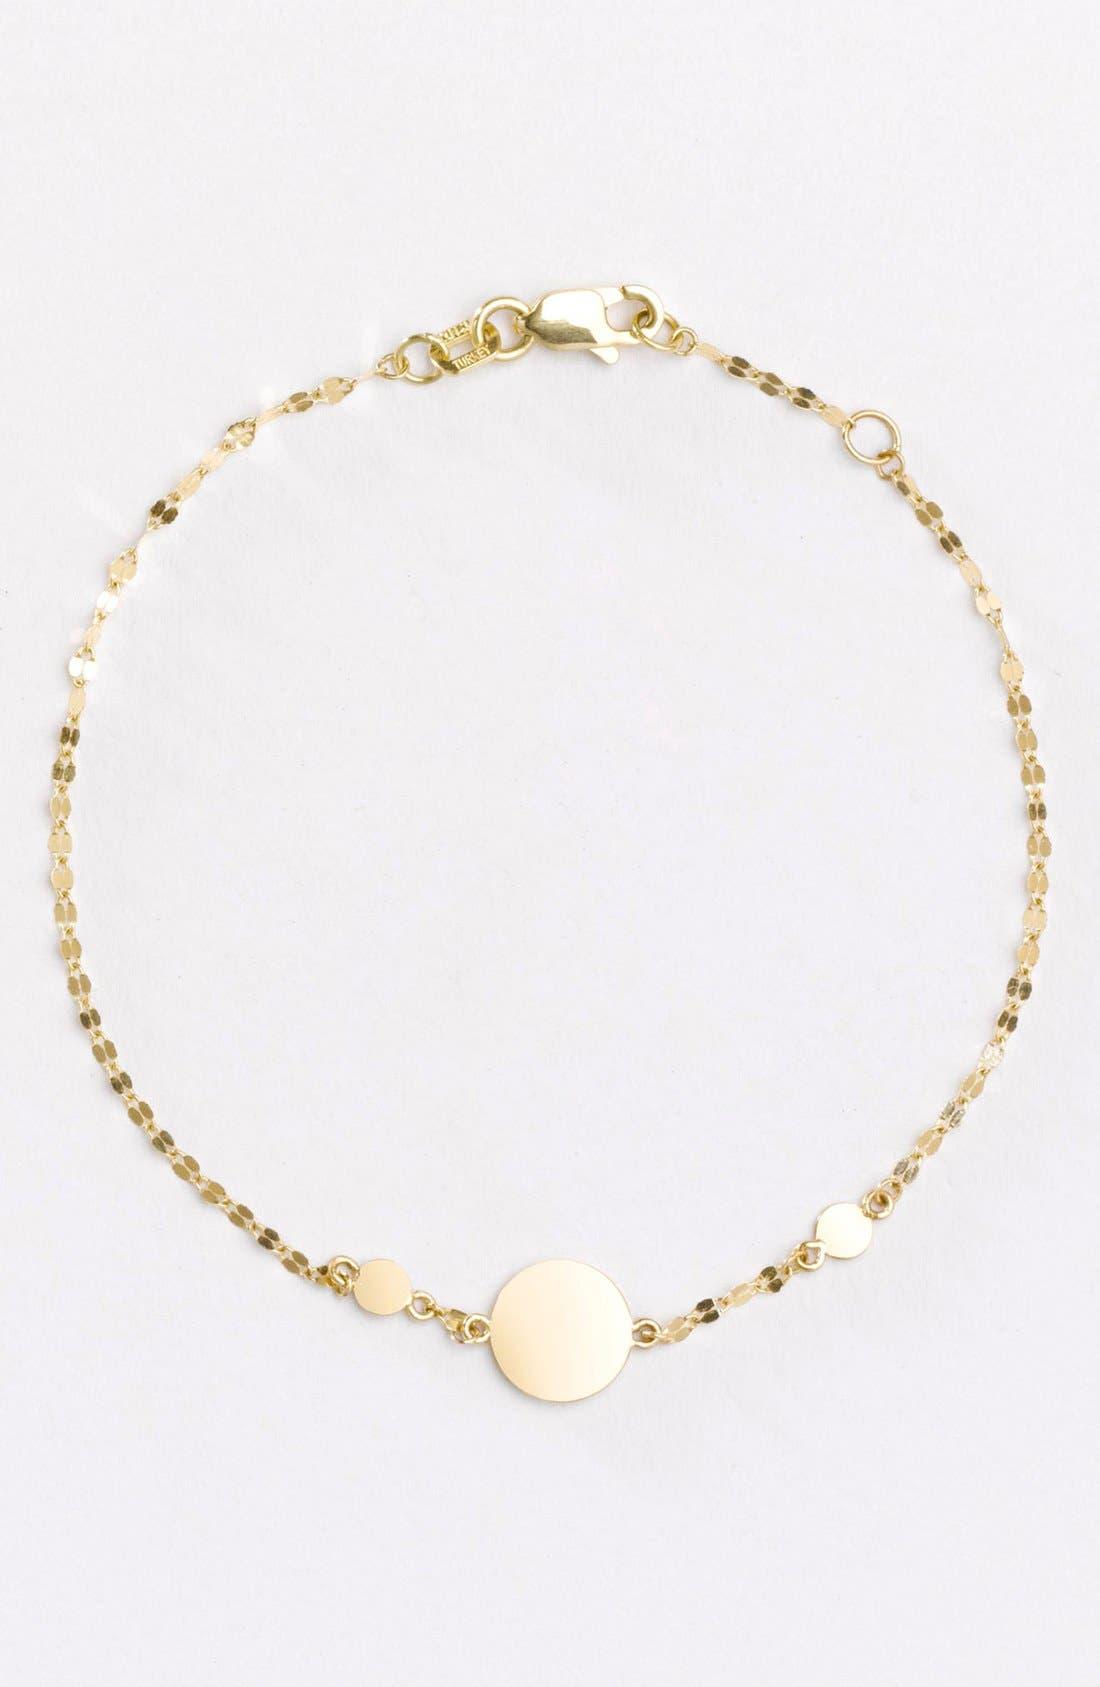 Alternate Image 1 Selected - Lana Jewelry Disc Station Bracelet